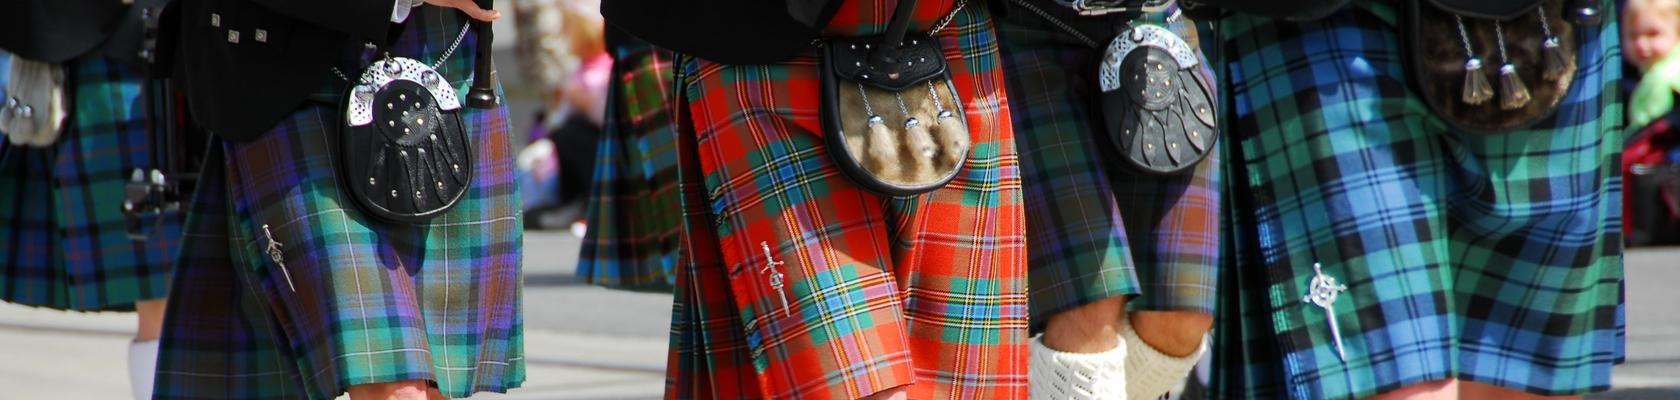 Schotse ruit